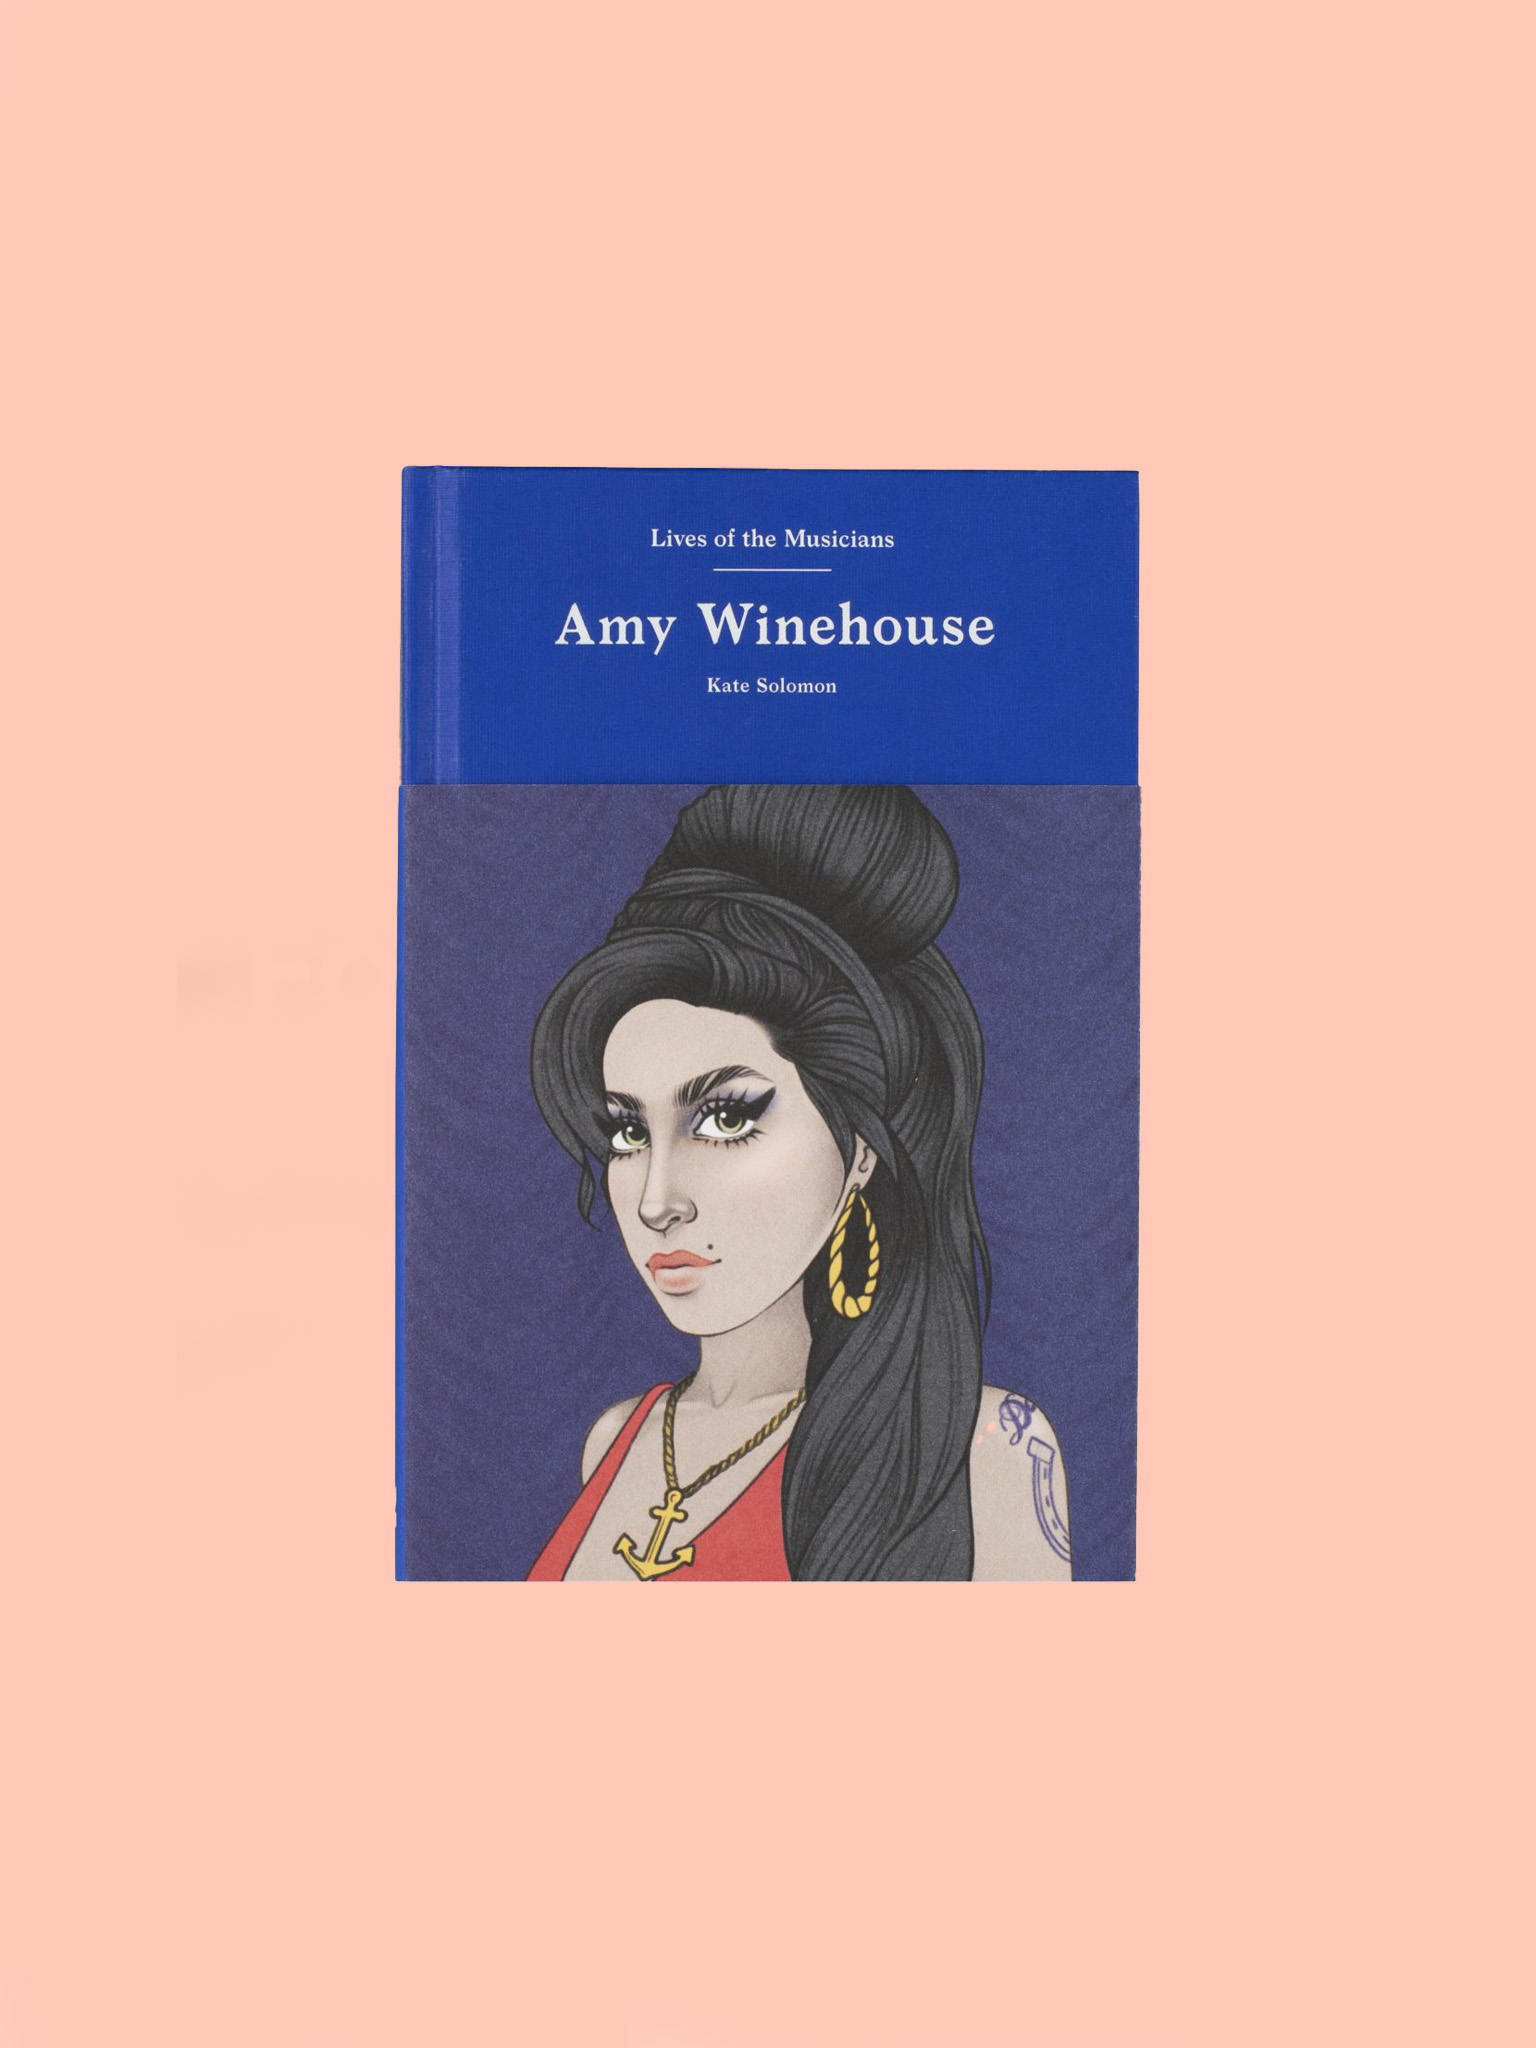 Laurence King Buch Amy Winehouse Biografie